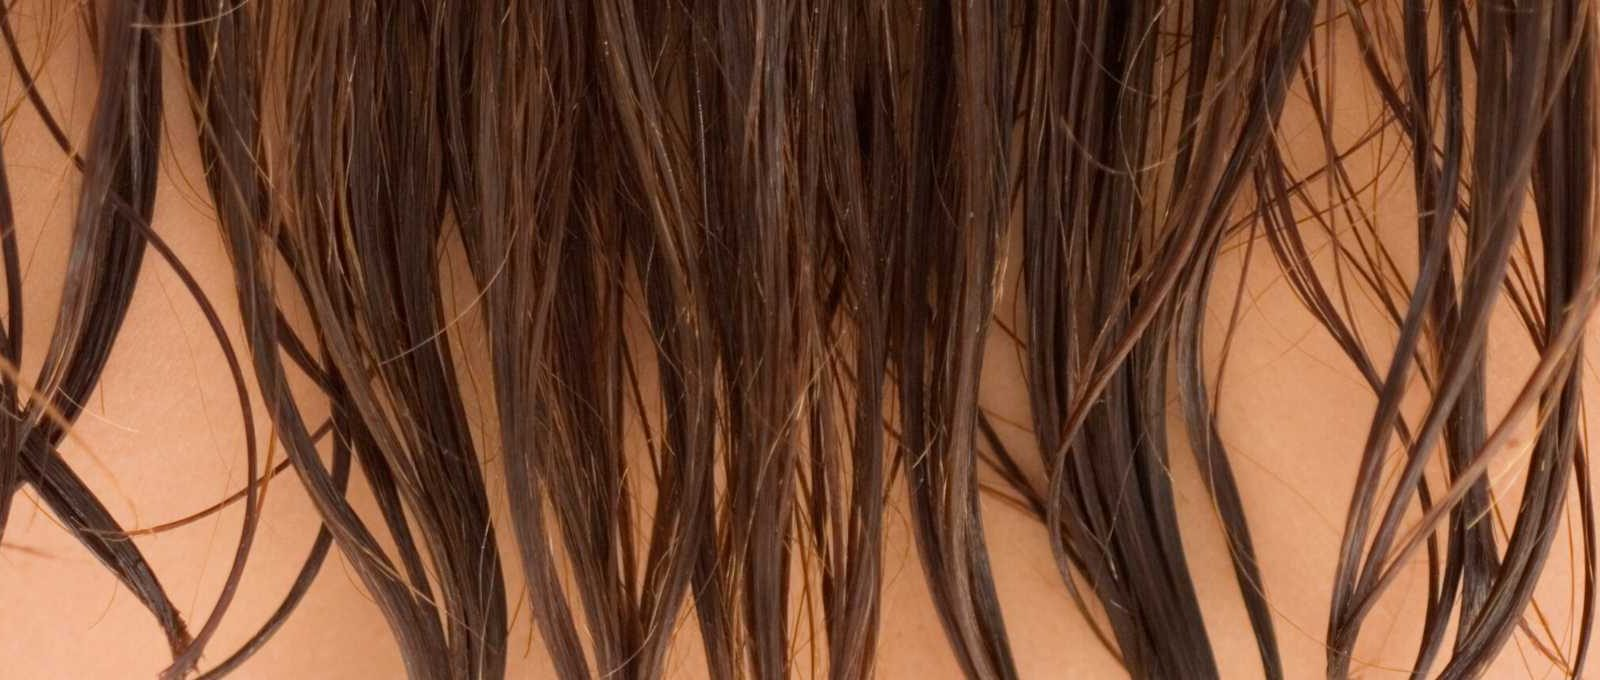 feniranje kose naopacke za volumen kose